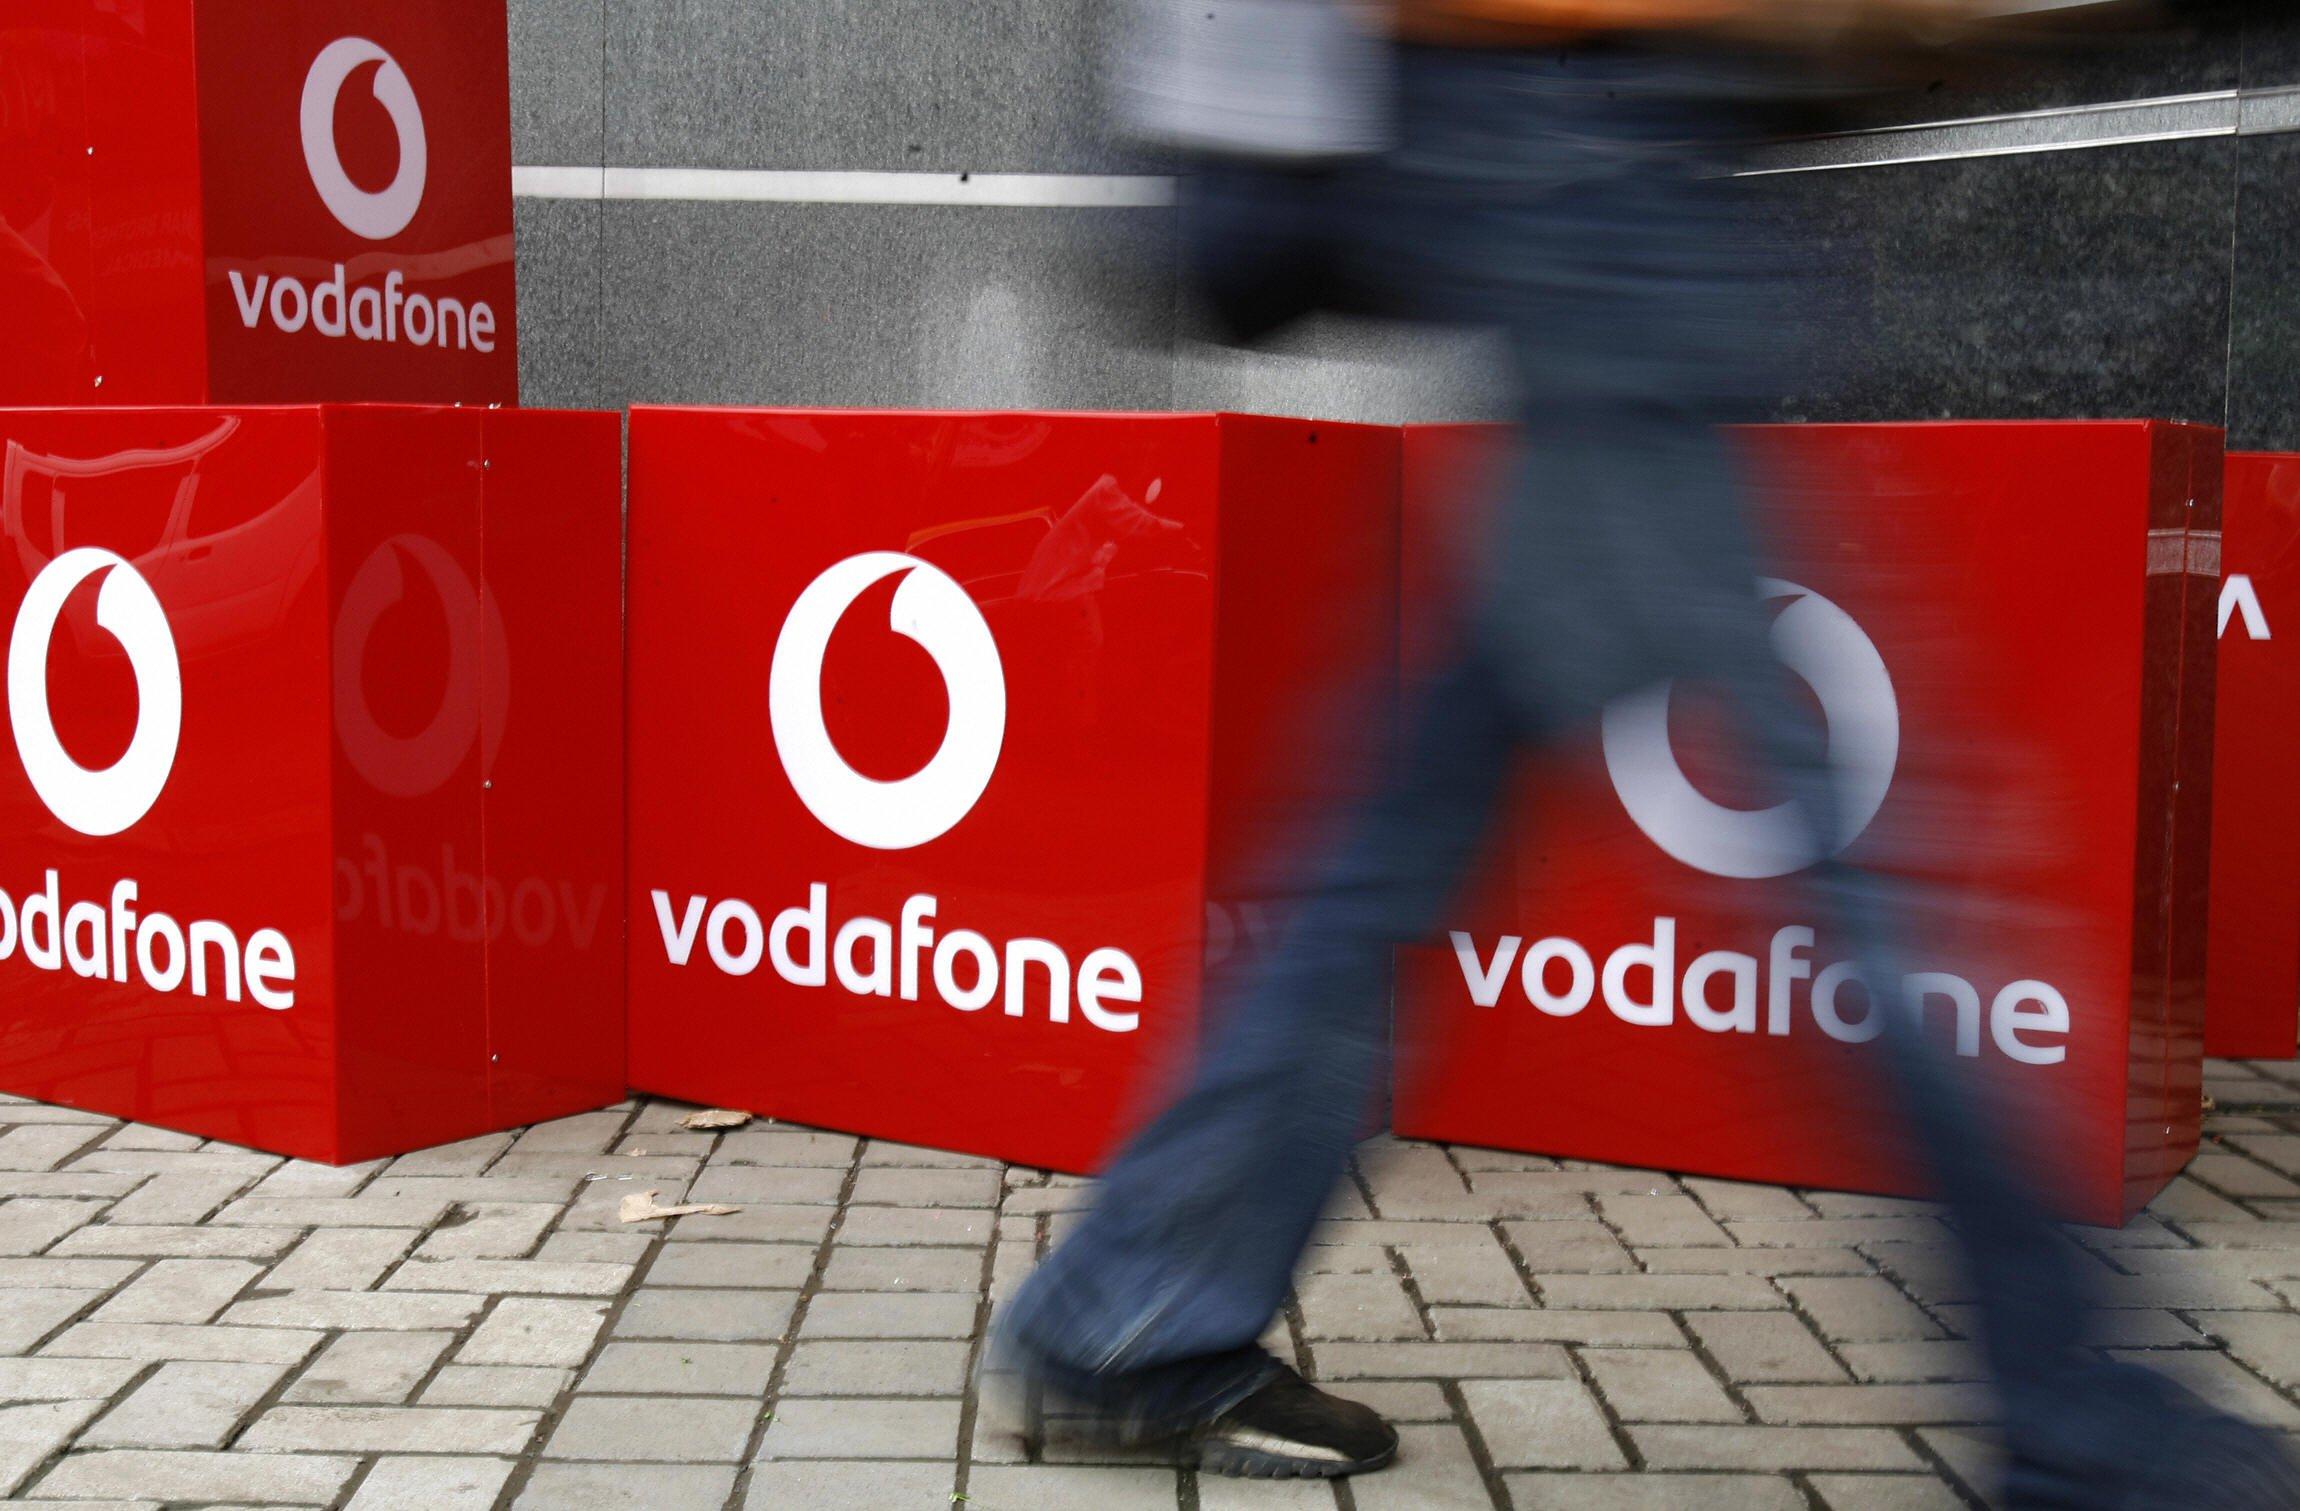 Vodafone's top Black Friday bargains